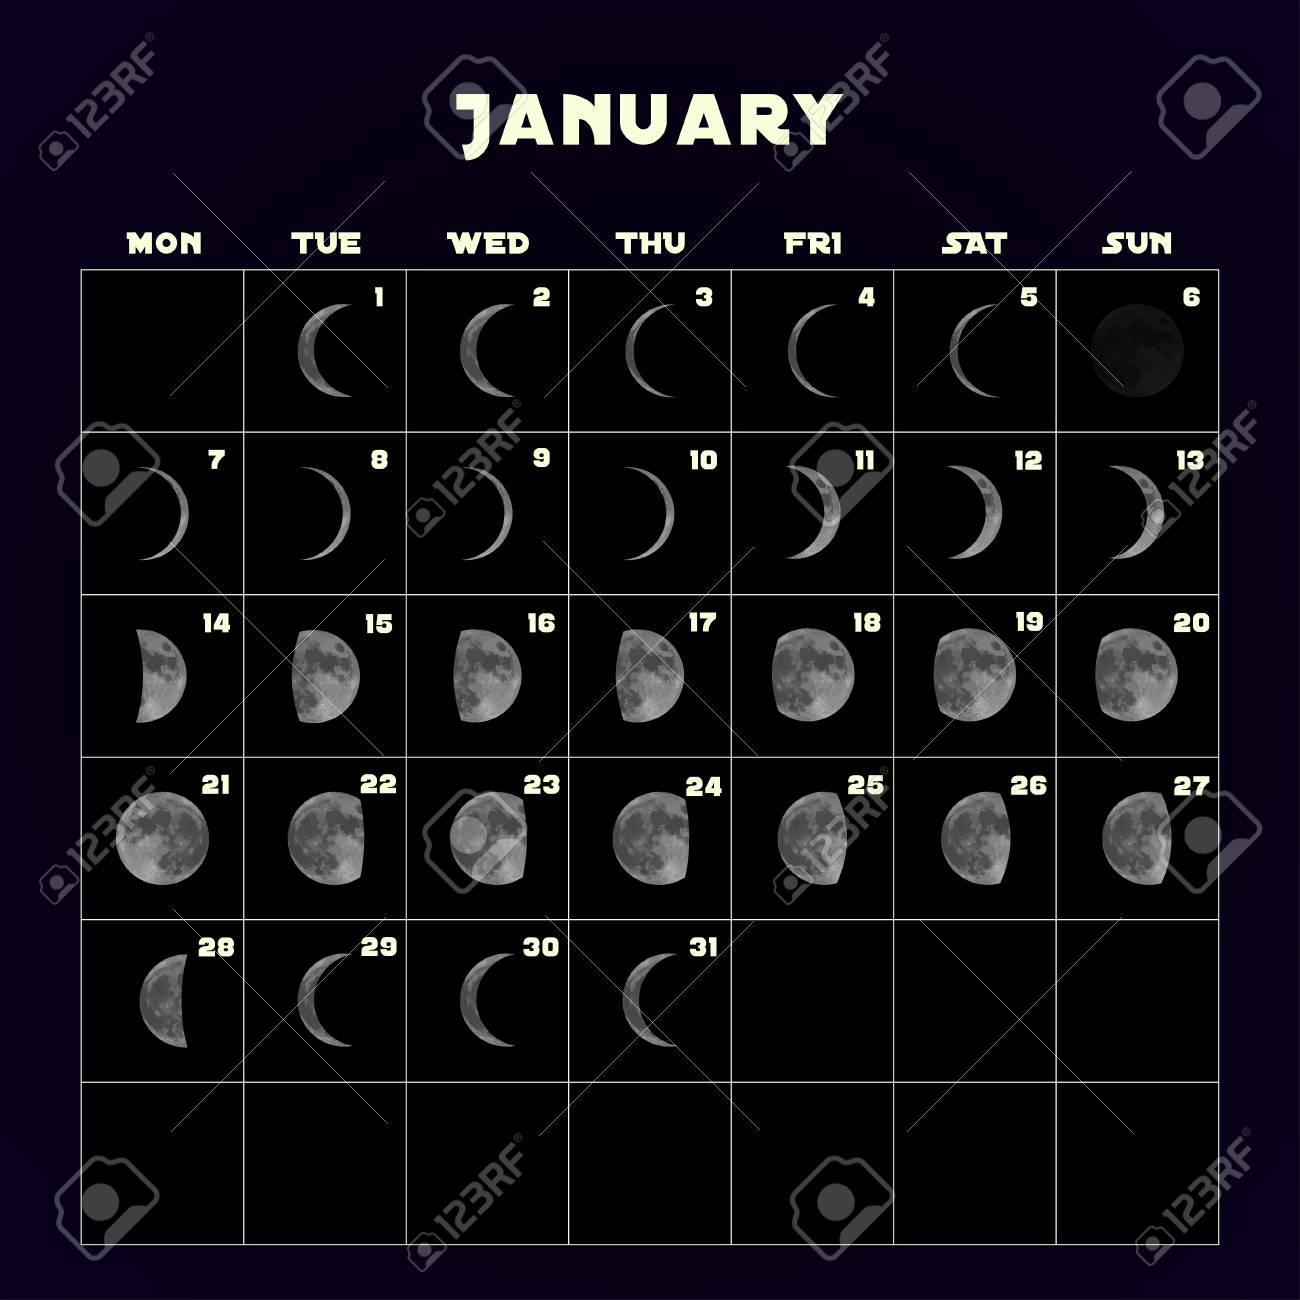 Moon Calendar 2019 January Moon Phases Calendar For 2019 With Realistic Moon. January. Vector